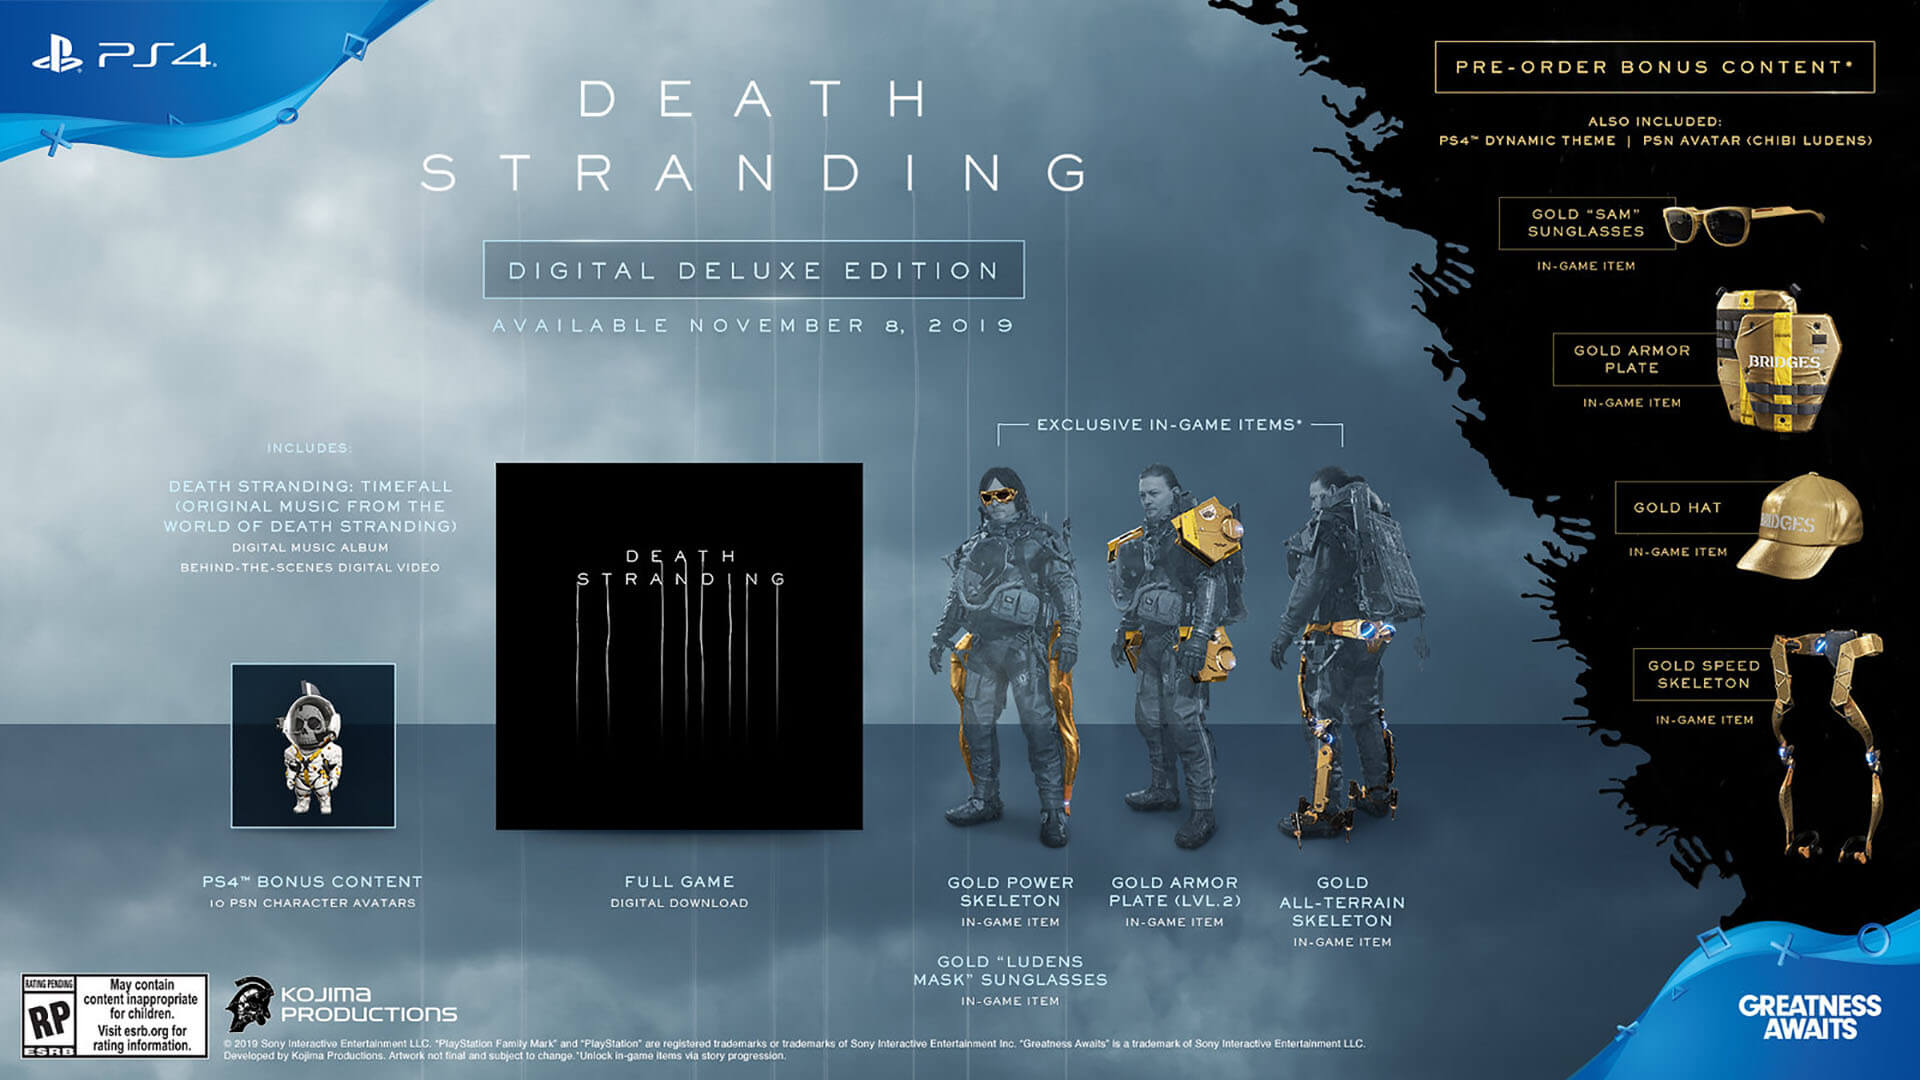 death stranding hideo kojima editions